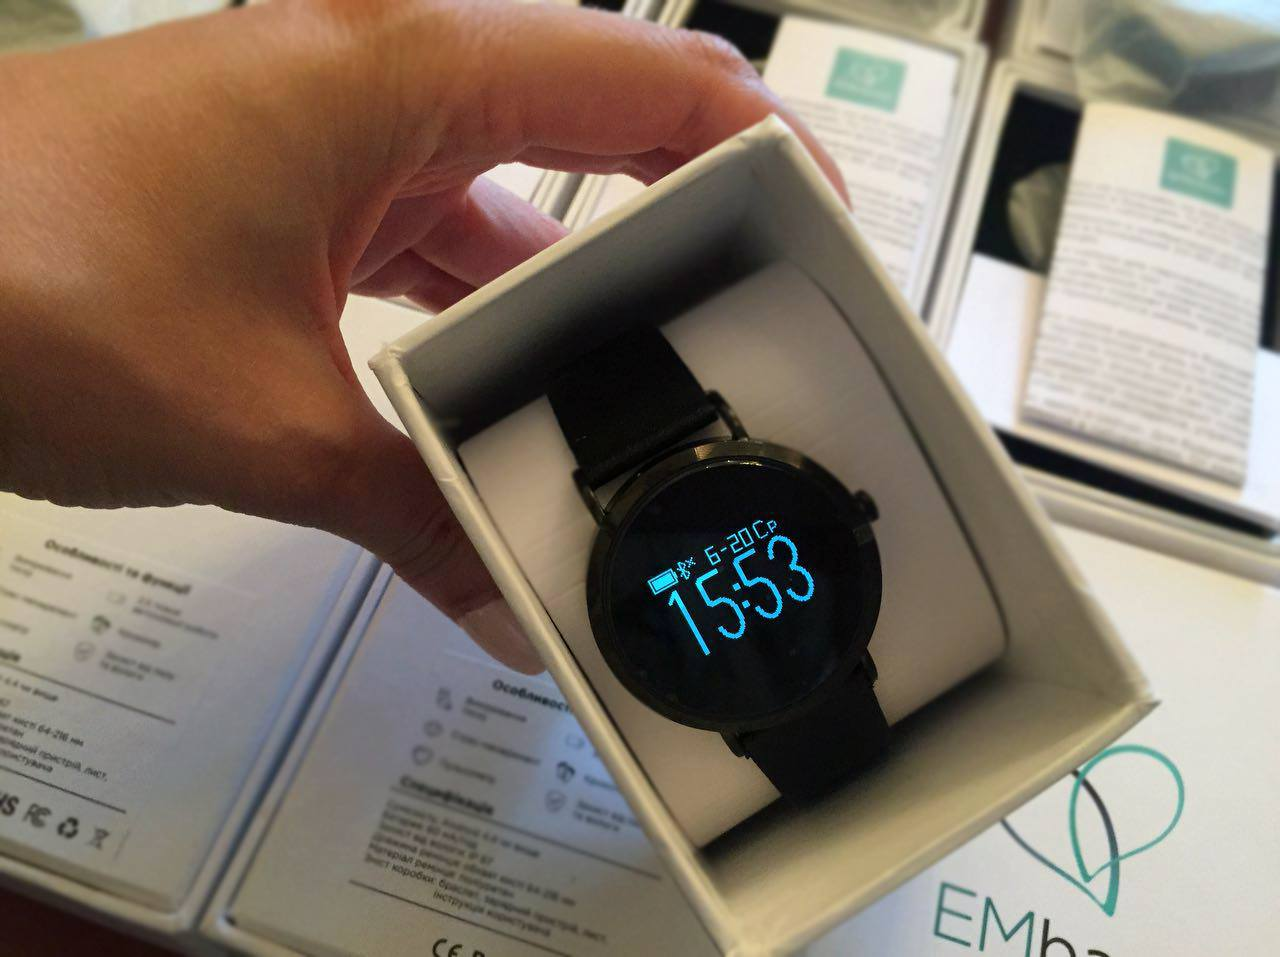 Jak vygljadaje ukraїnśkyj godynnyk, ščo konkuruvatyme z Apple Watch